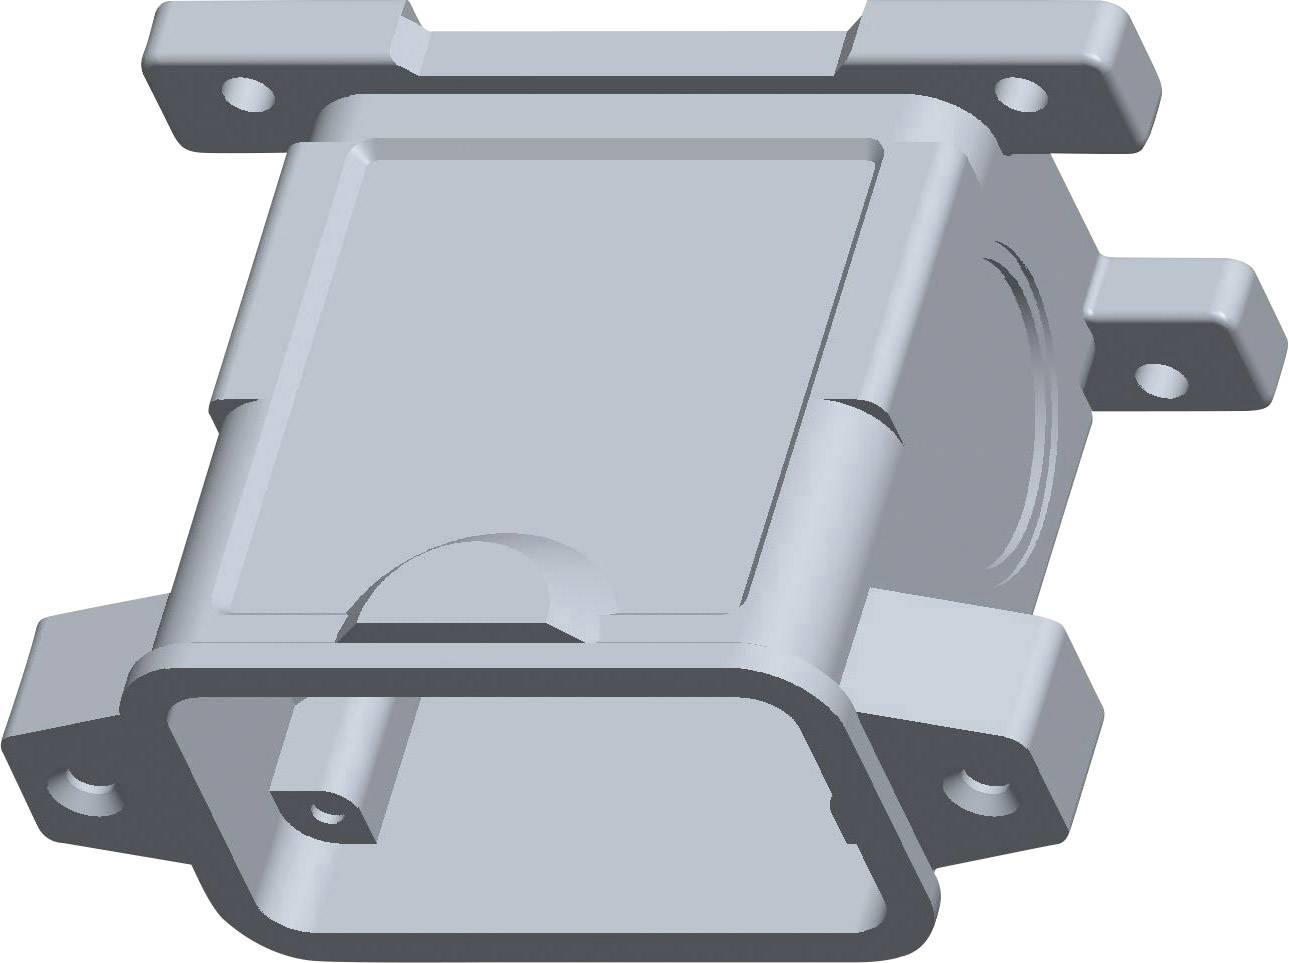 Ochranná krytka TE Connectivity HIP.10/24.SG.2.M32.G 1106435-1, IP68, stříbrnošedá, 1 ks